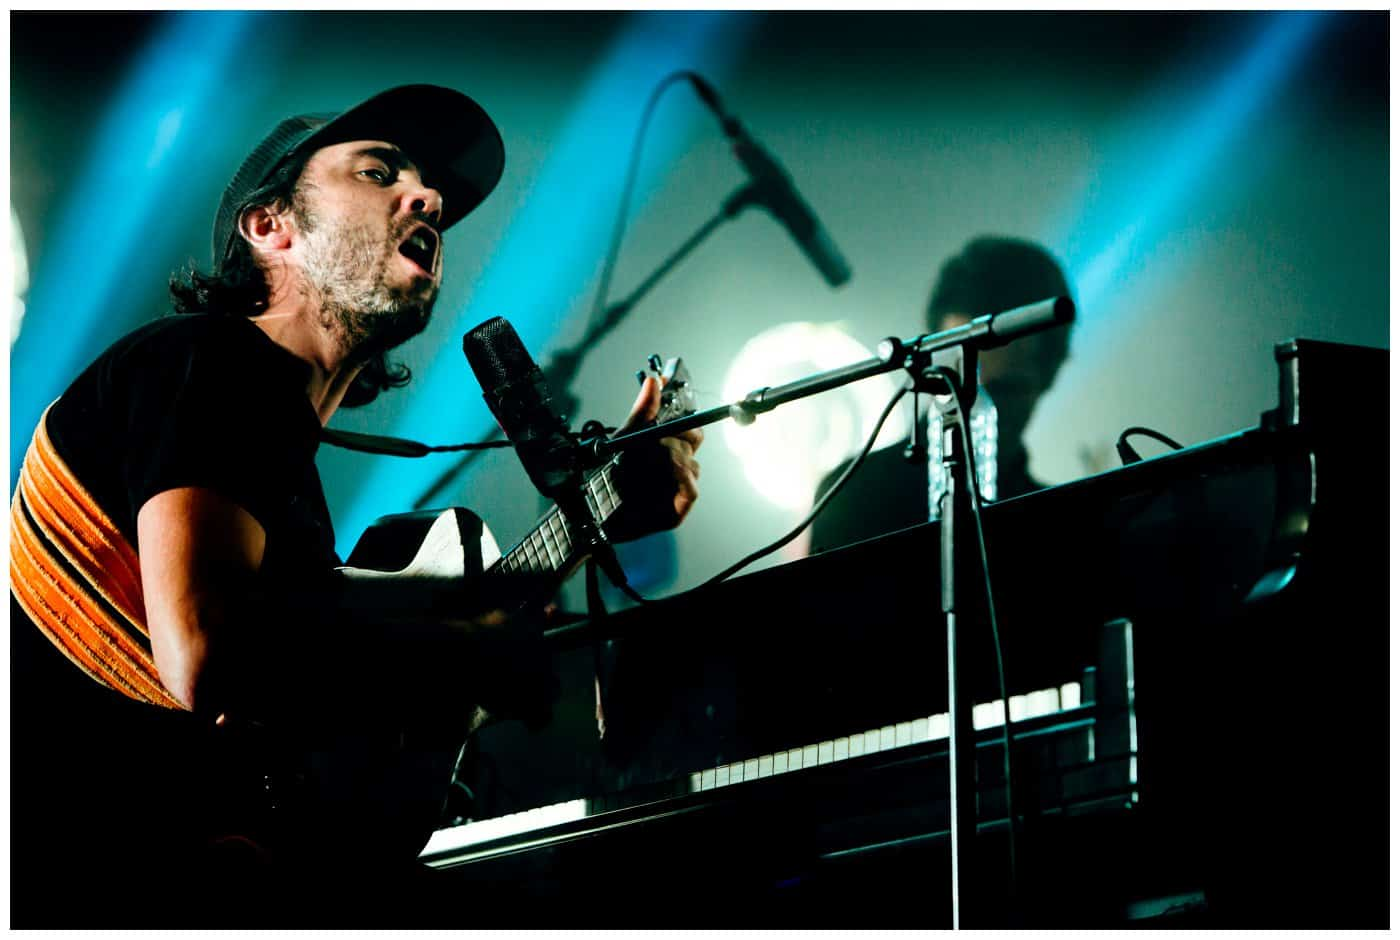 montreal-music-photographer_1133